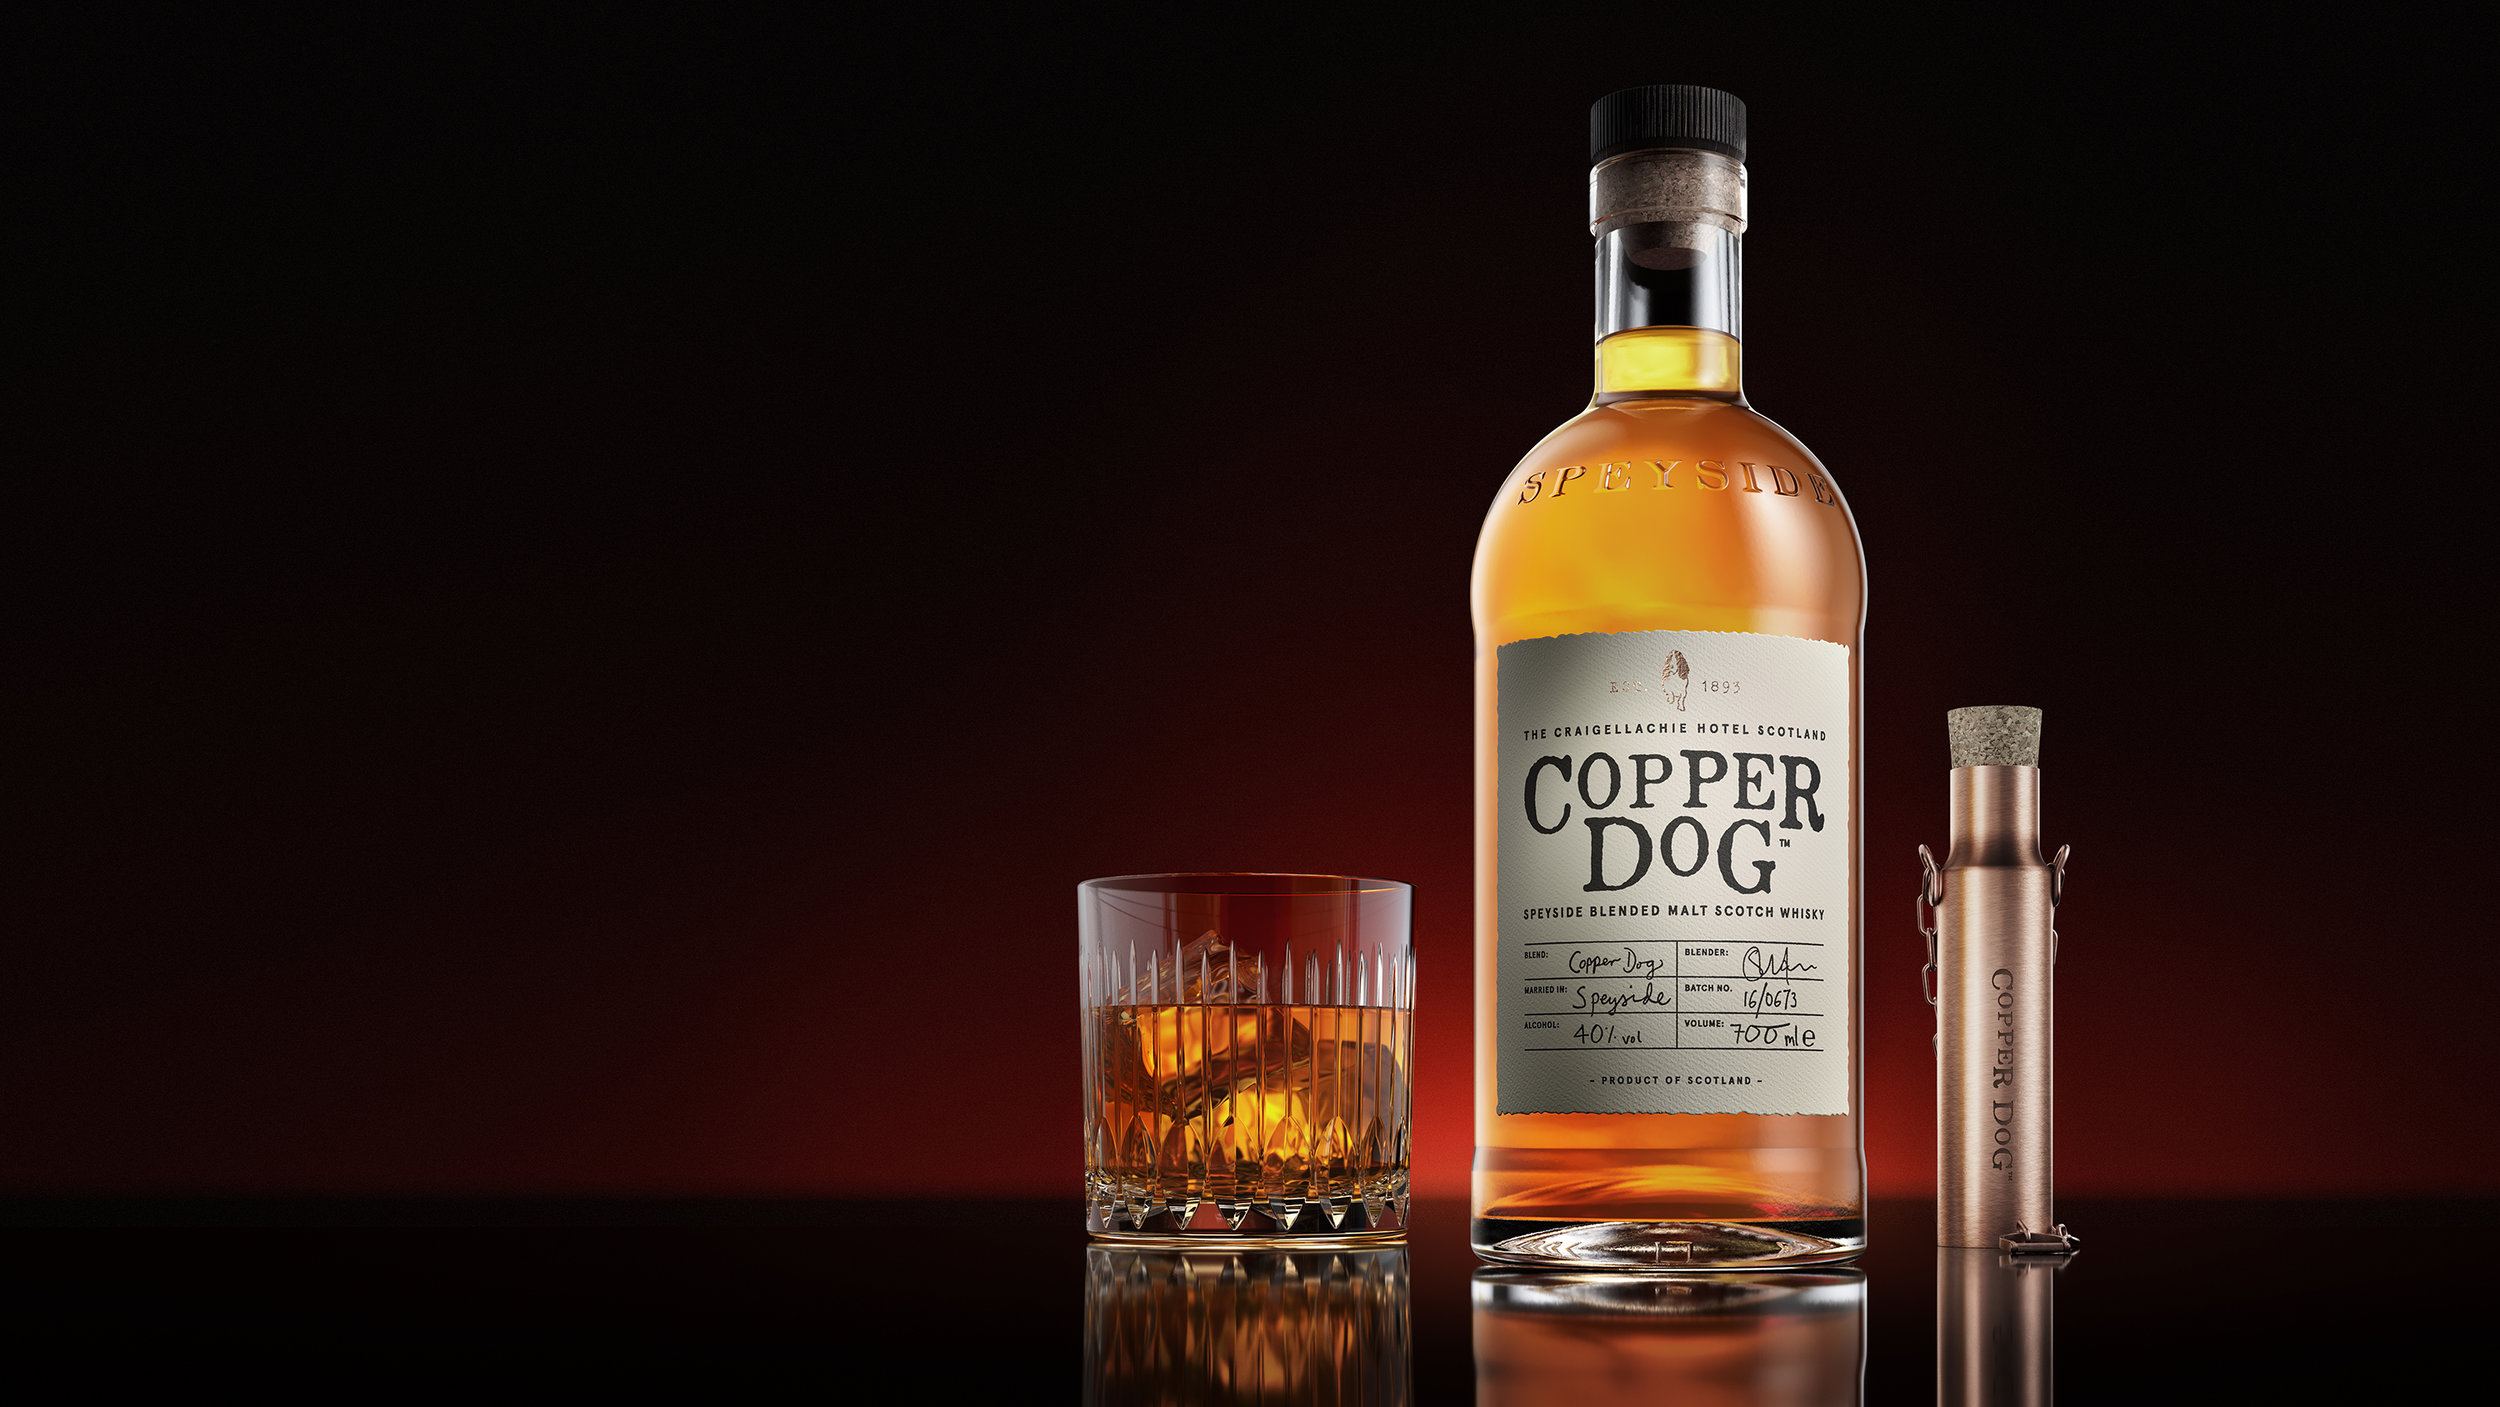 COPPER DOG - FINAL - 16 X 9 - SMALL.jpg